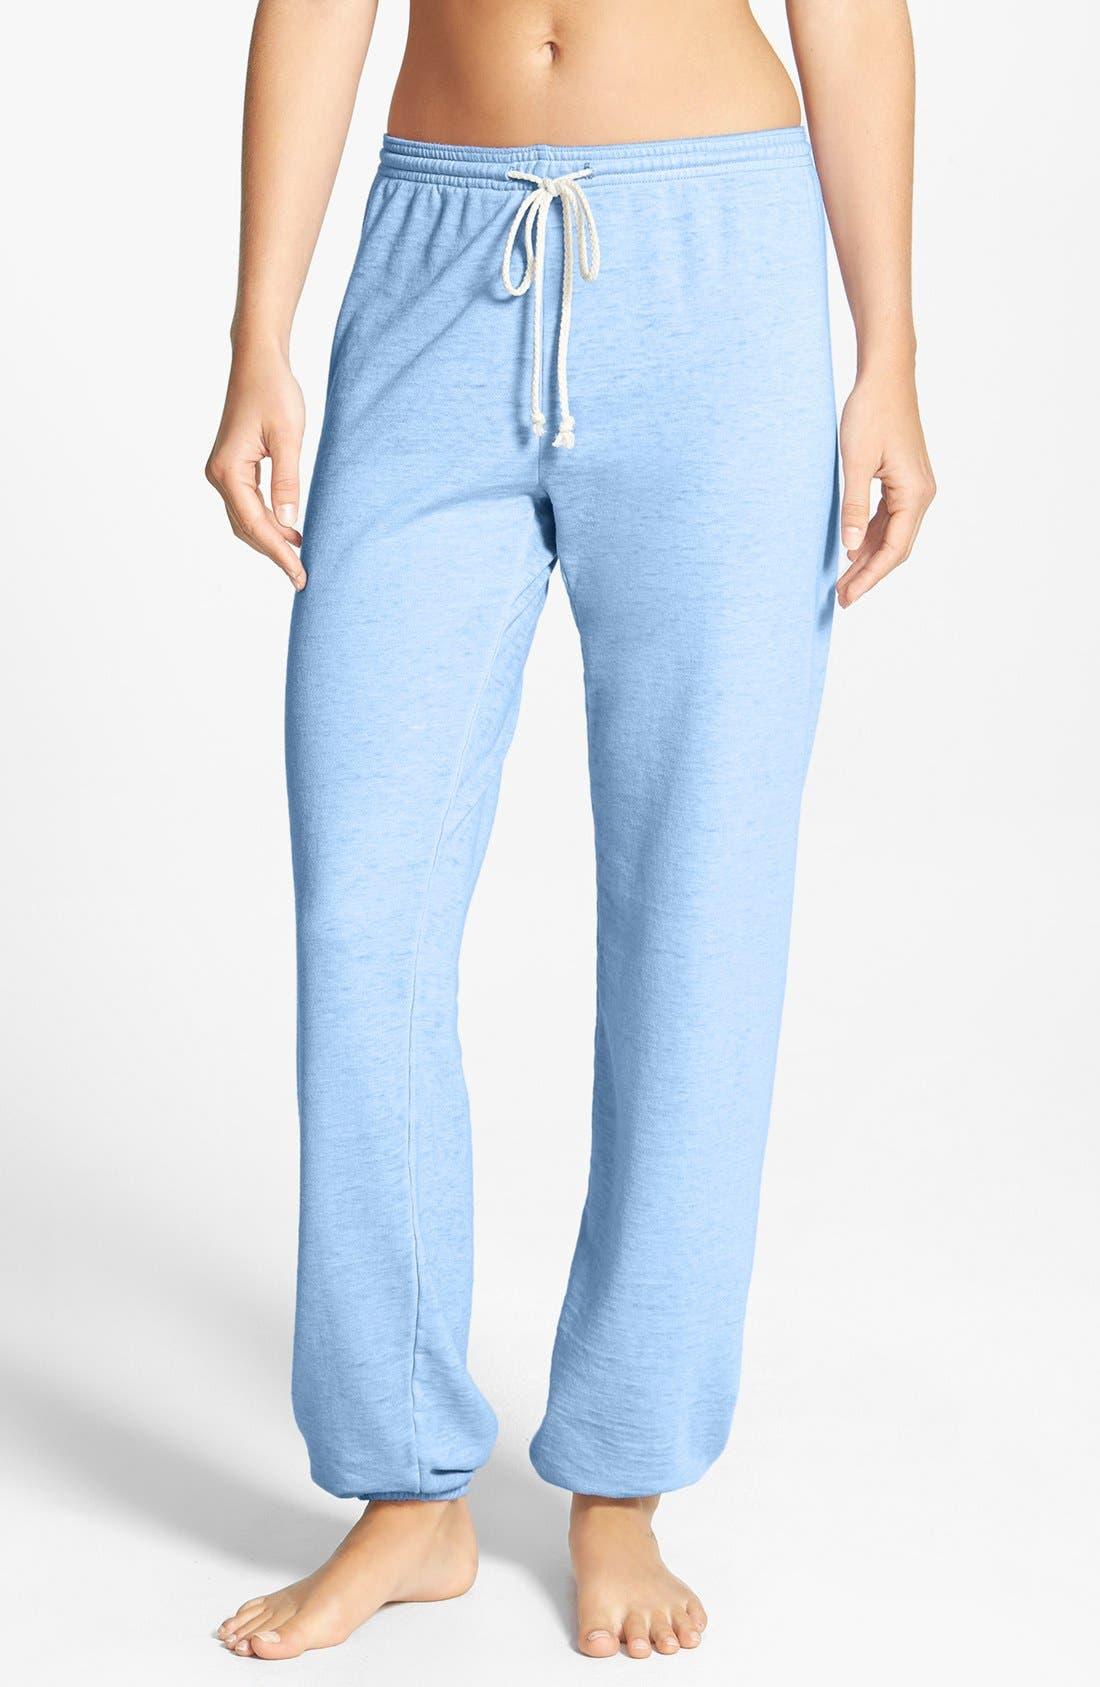 Alternate Image 1 Selected - Make + Model 'Sunday Kinda Love' Lounge Pants